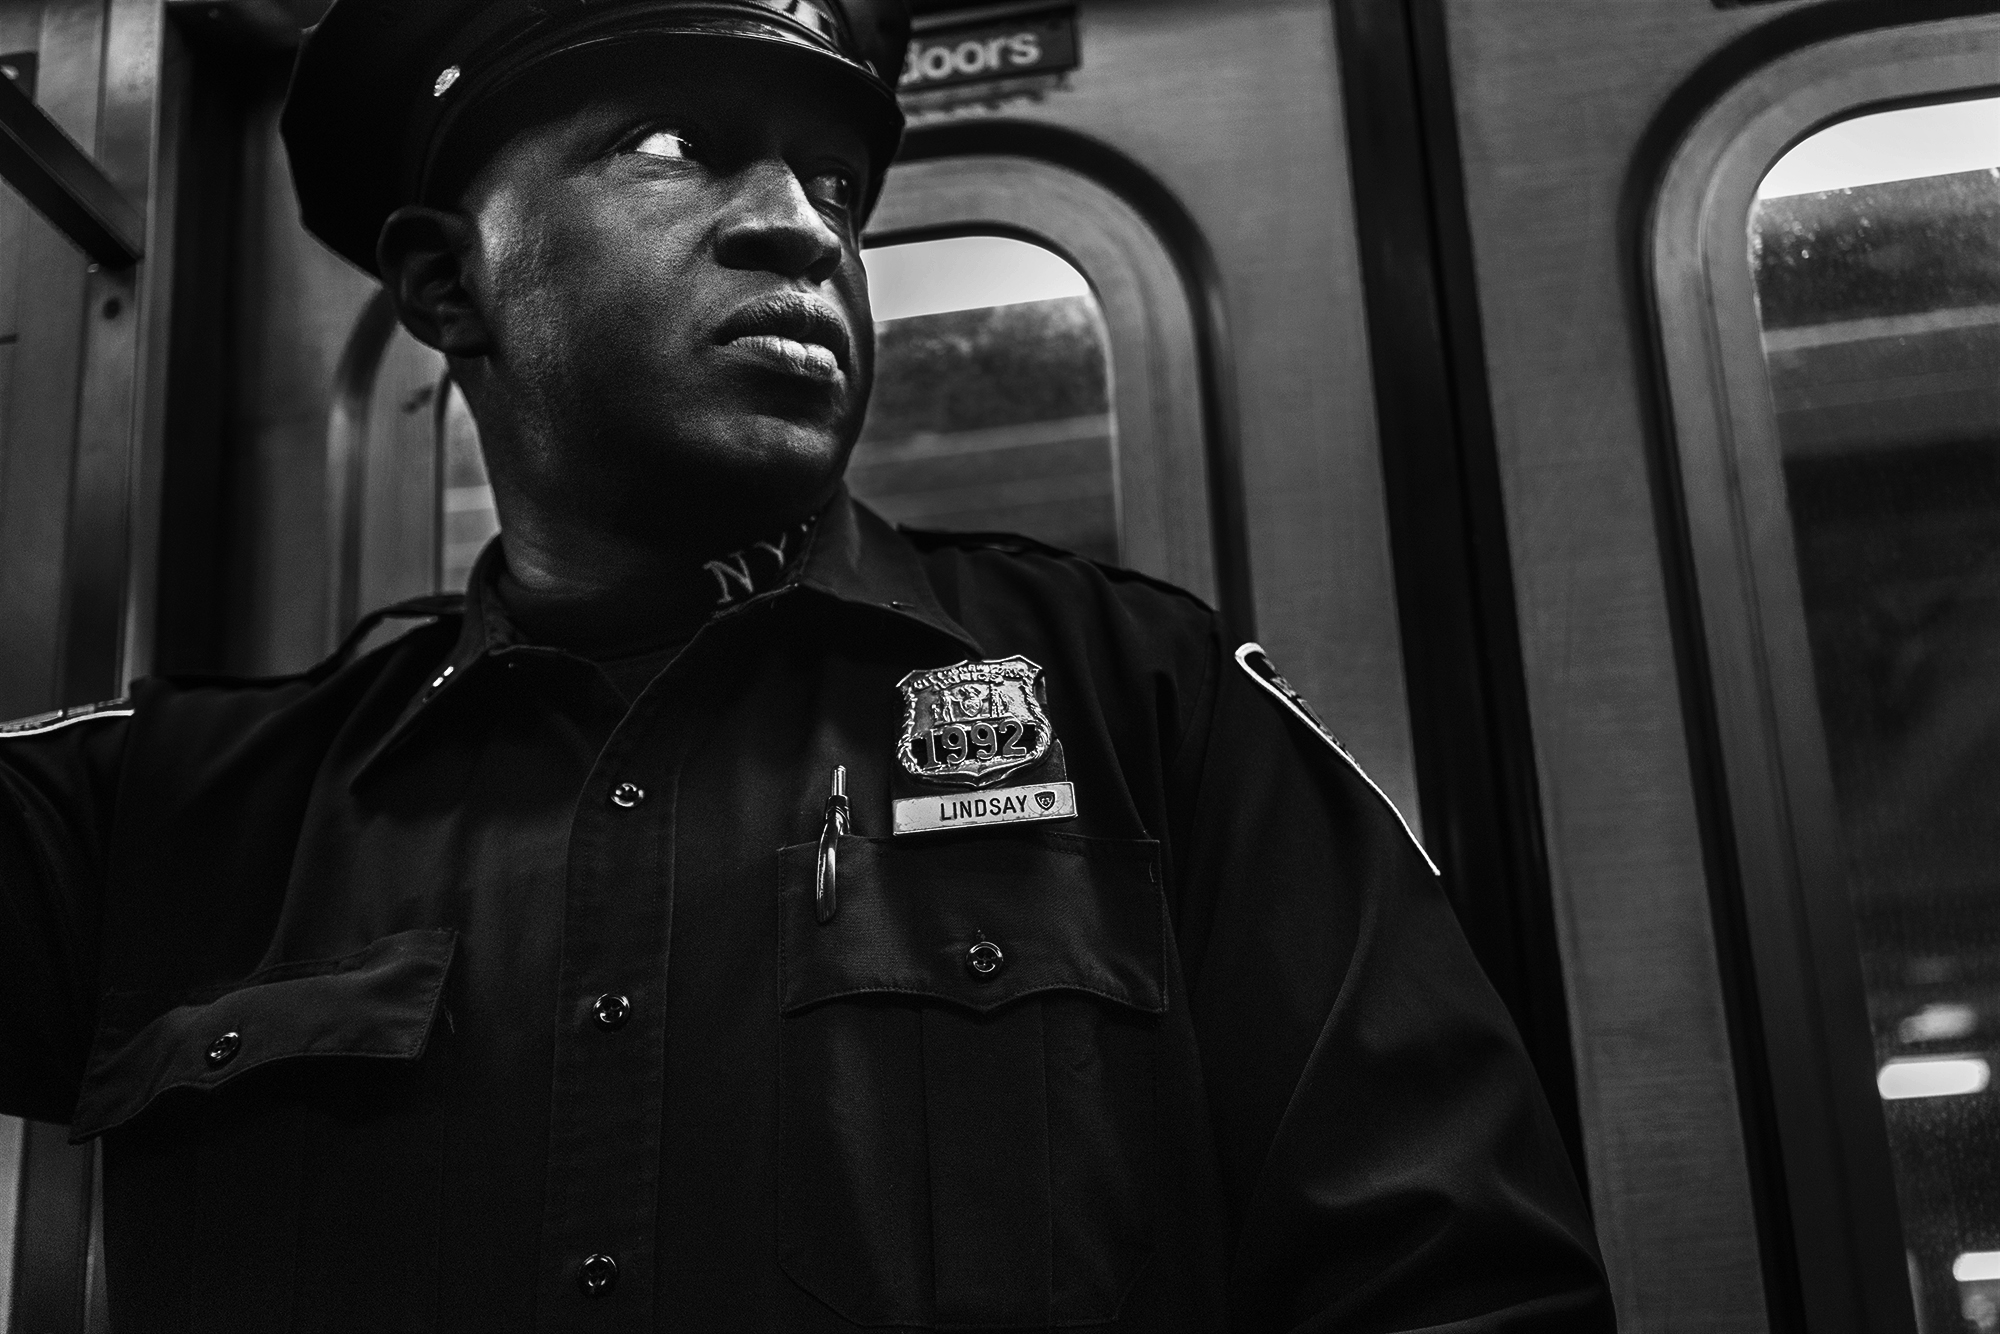 Brklyn_Subway_2018_Police_Officer_Lindsey_-002.jpg